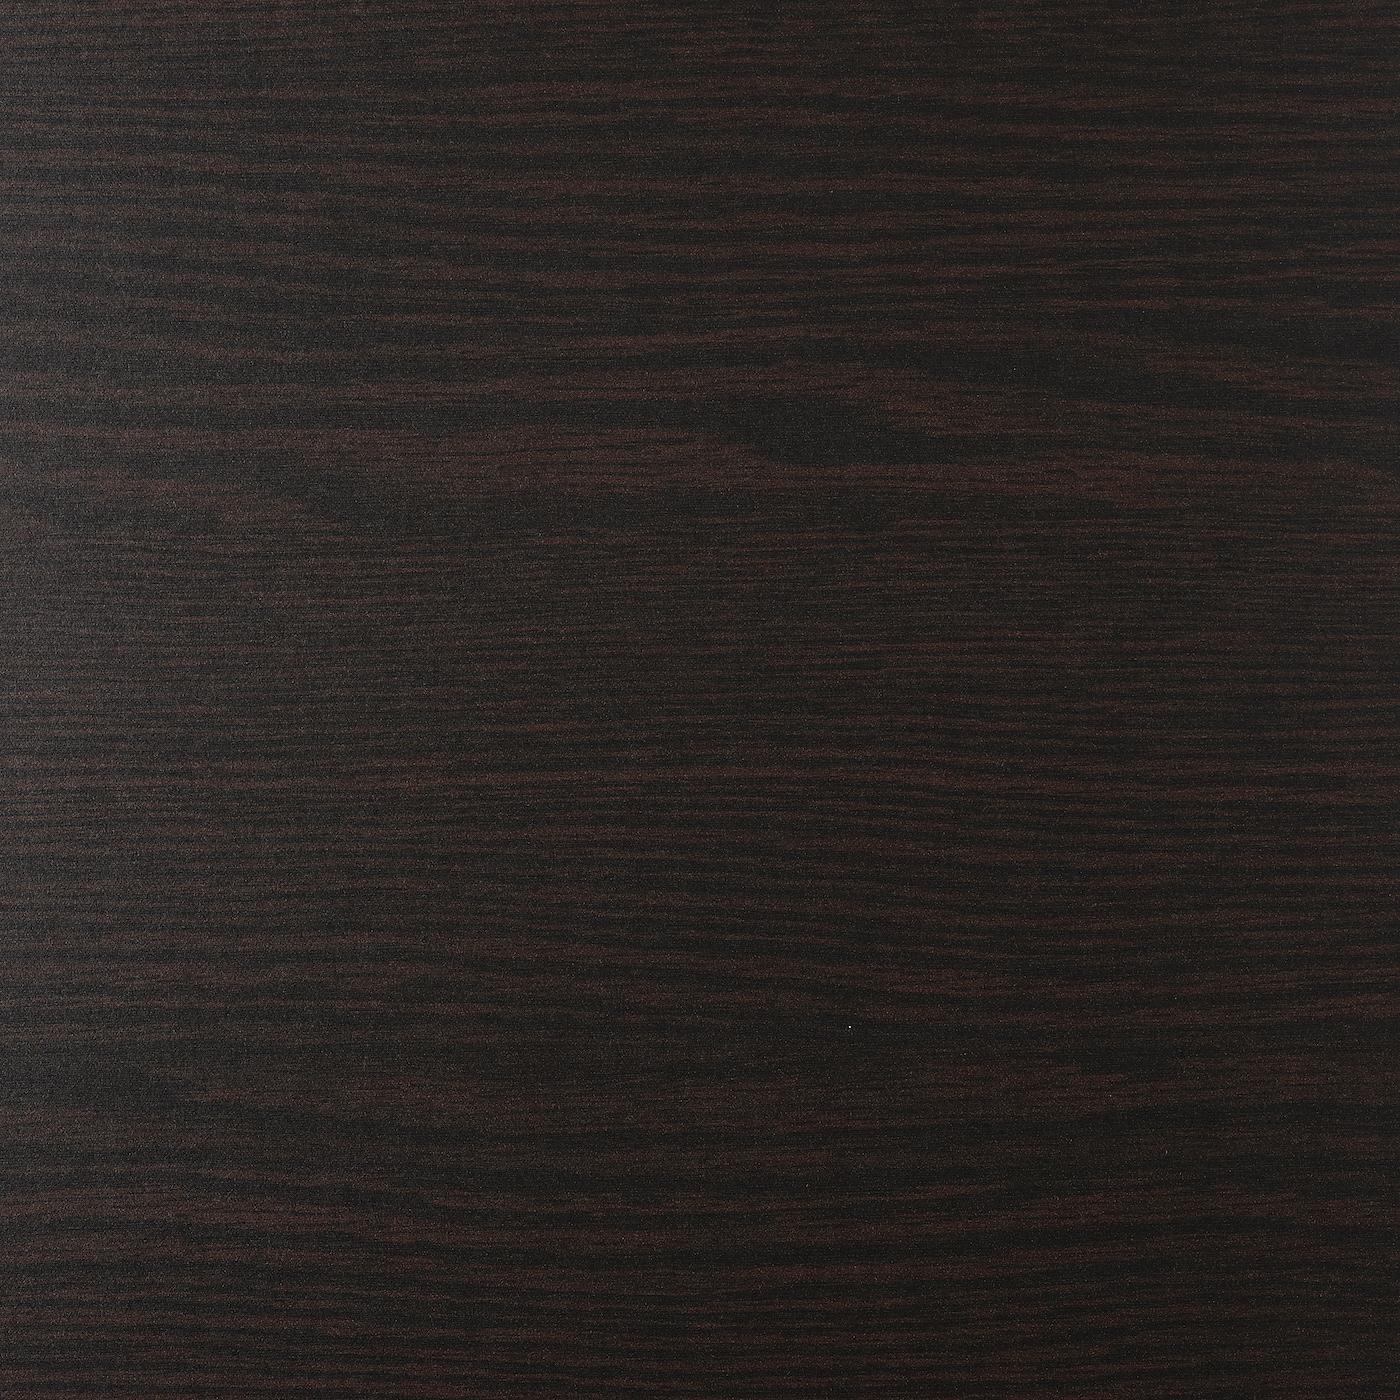 KOMPLEMENT رف, أسود-بني, 75x58 سم